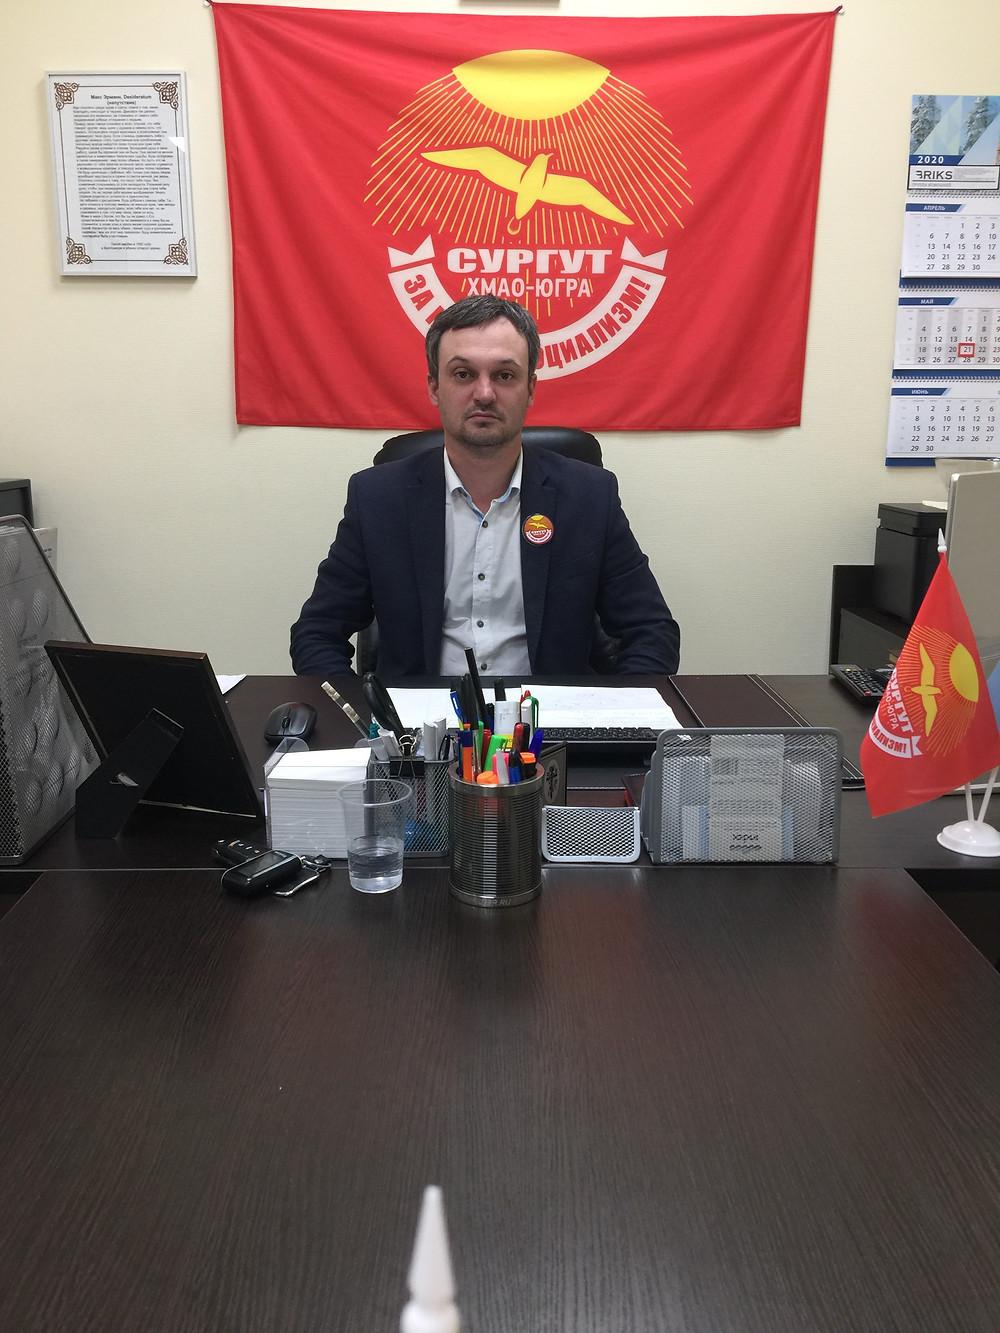 Чесноков Вячеслав За новый социализм Сургут